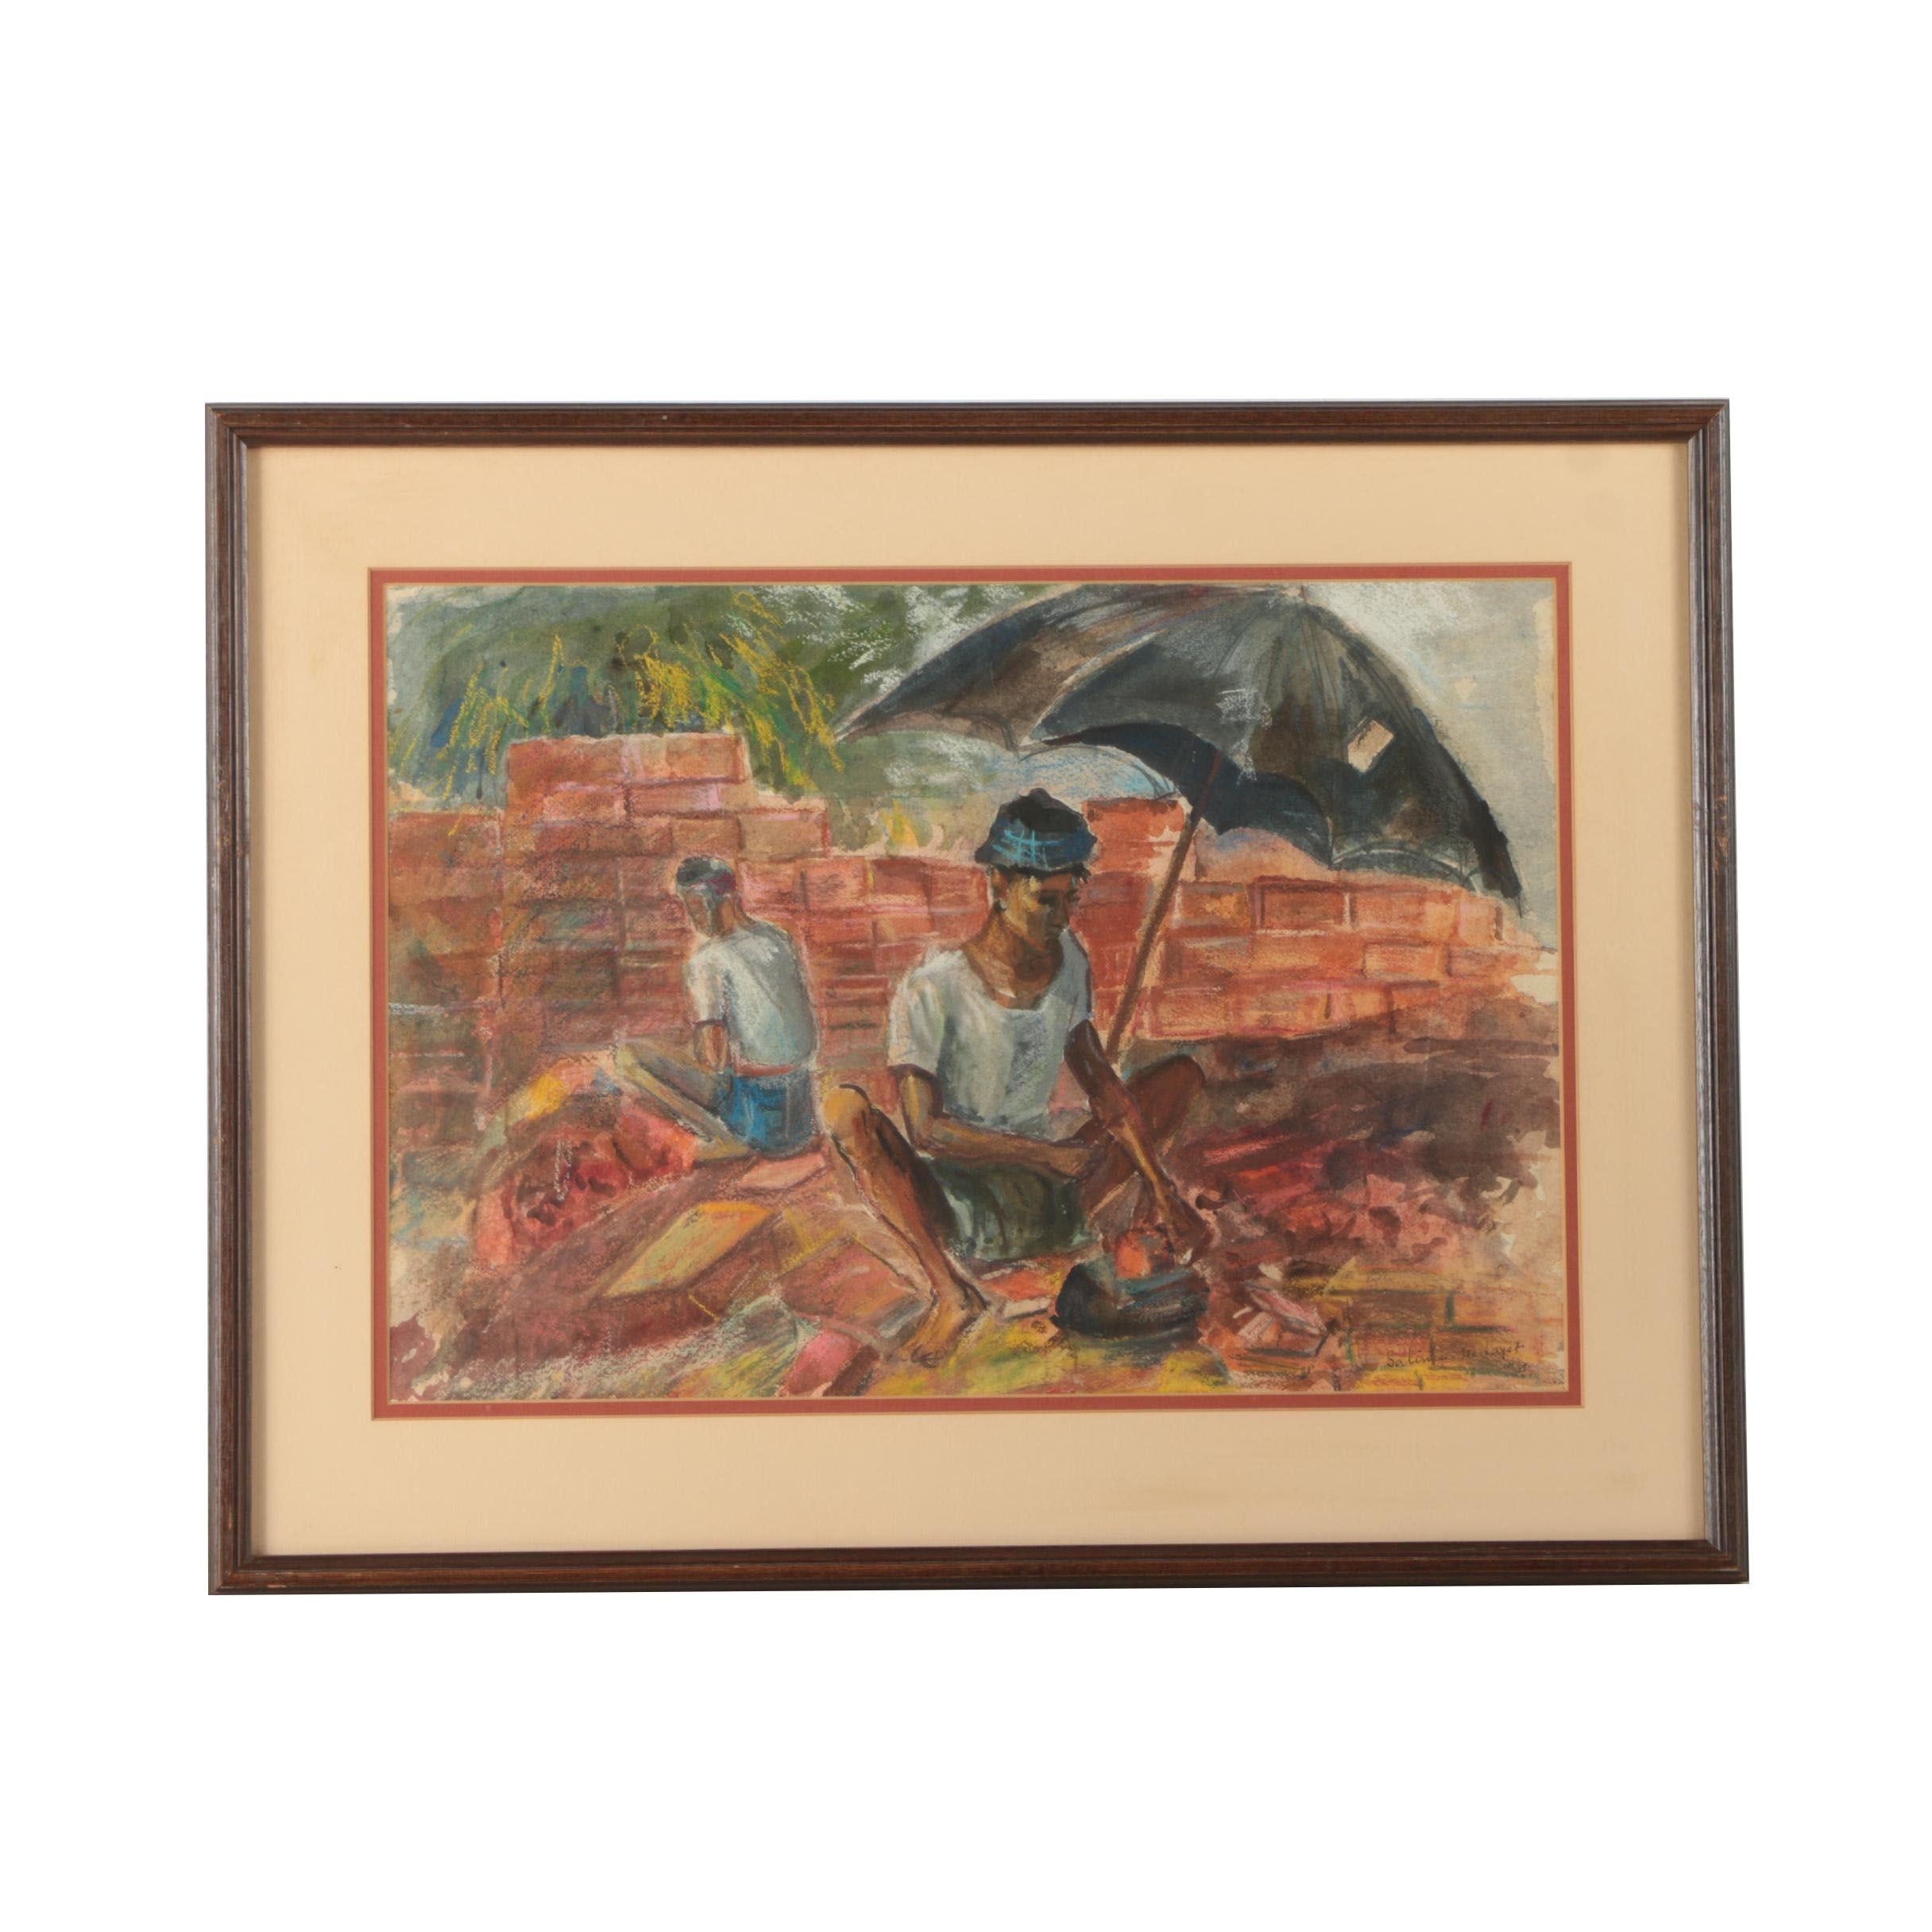 Salima Hedayet 1964 Watercolor and Pastel Illustration of Brick Masons at Work